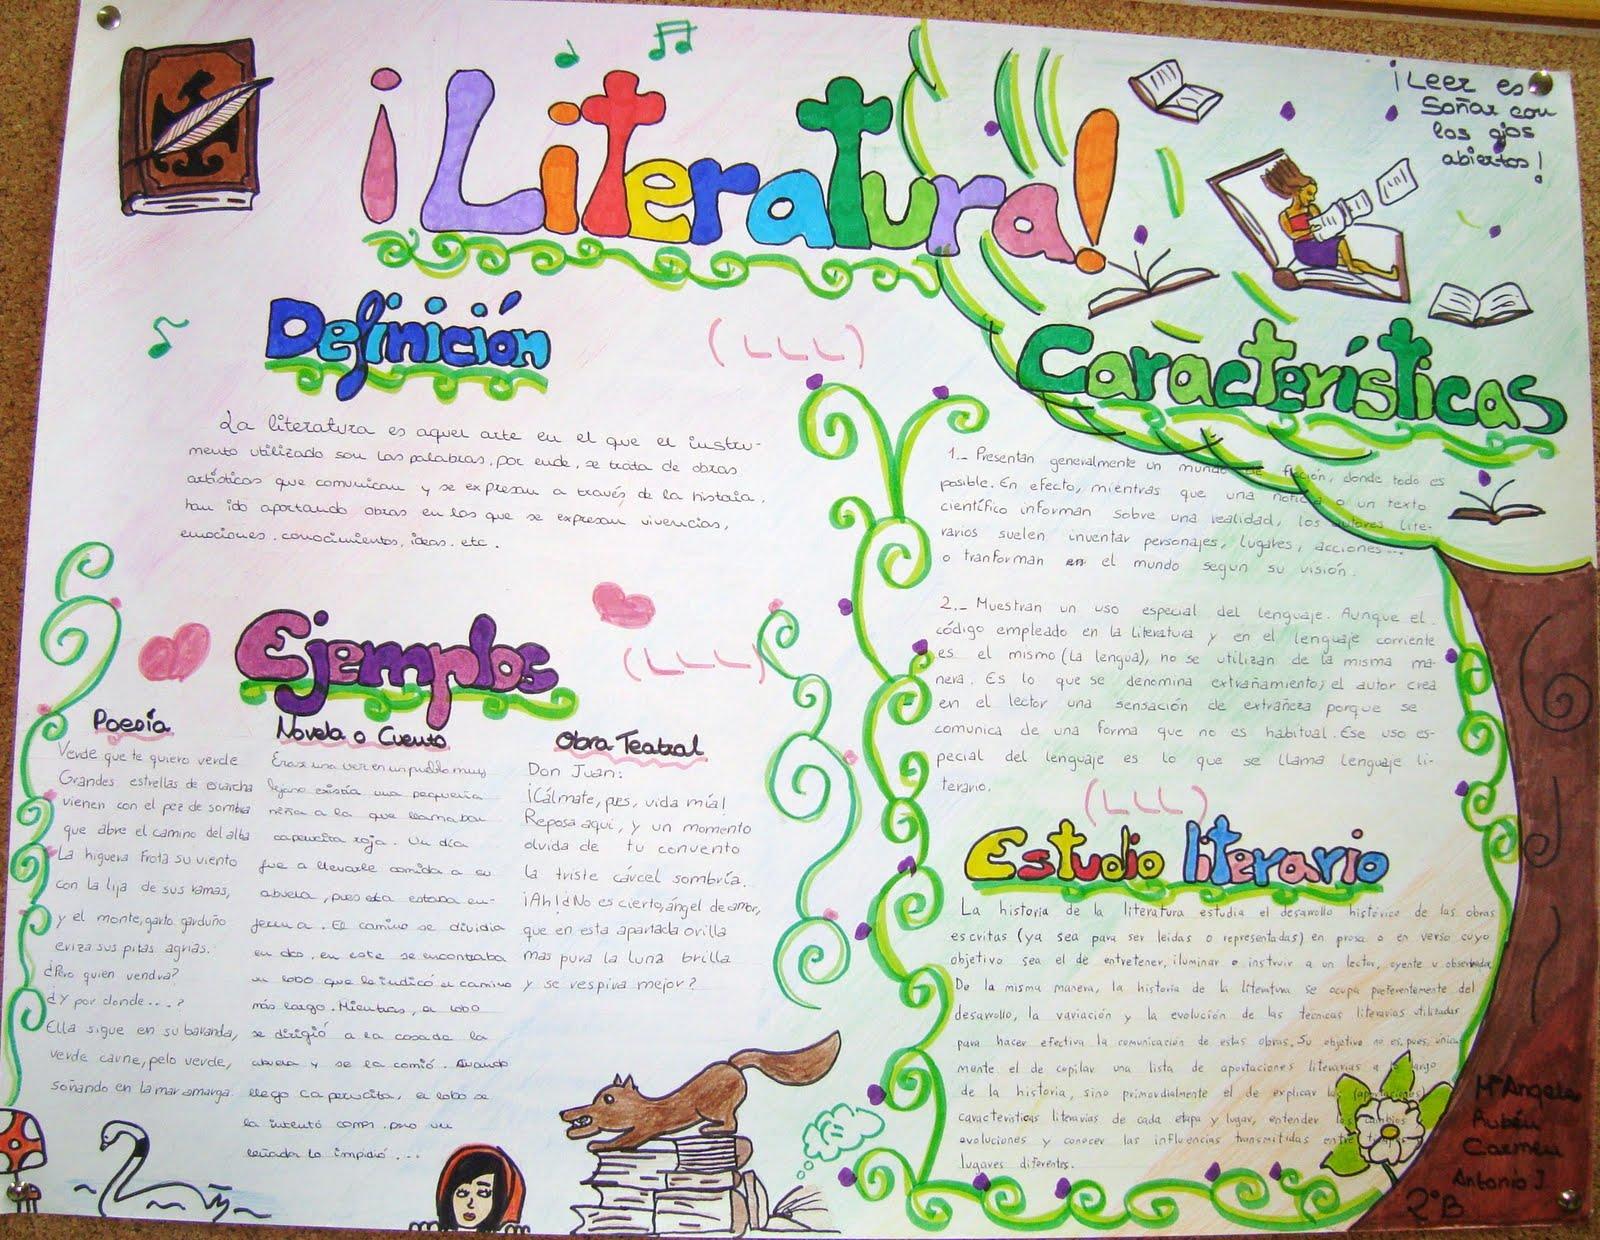 Blog del ies laguna de toll n g neros literarios for Definicion periodico mural